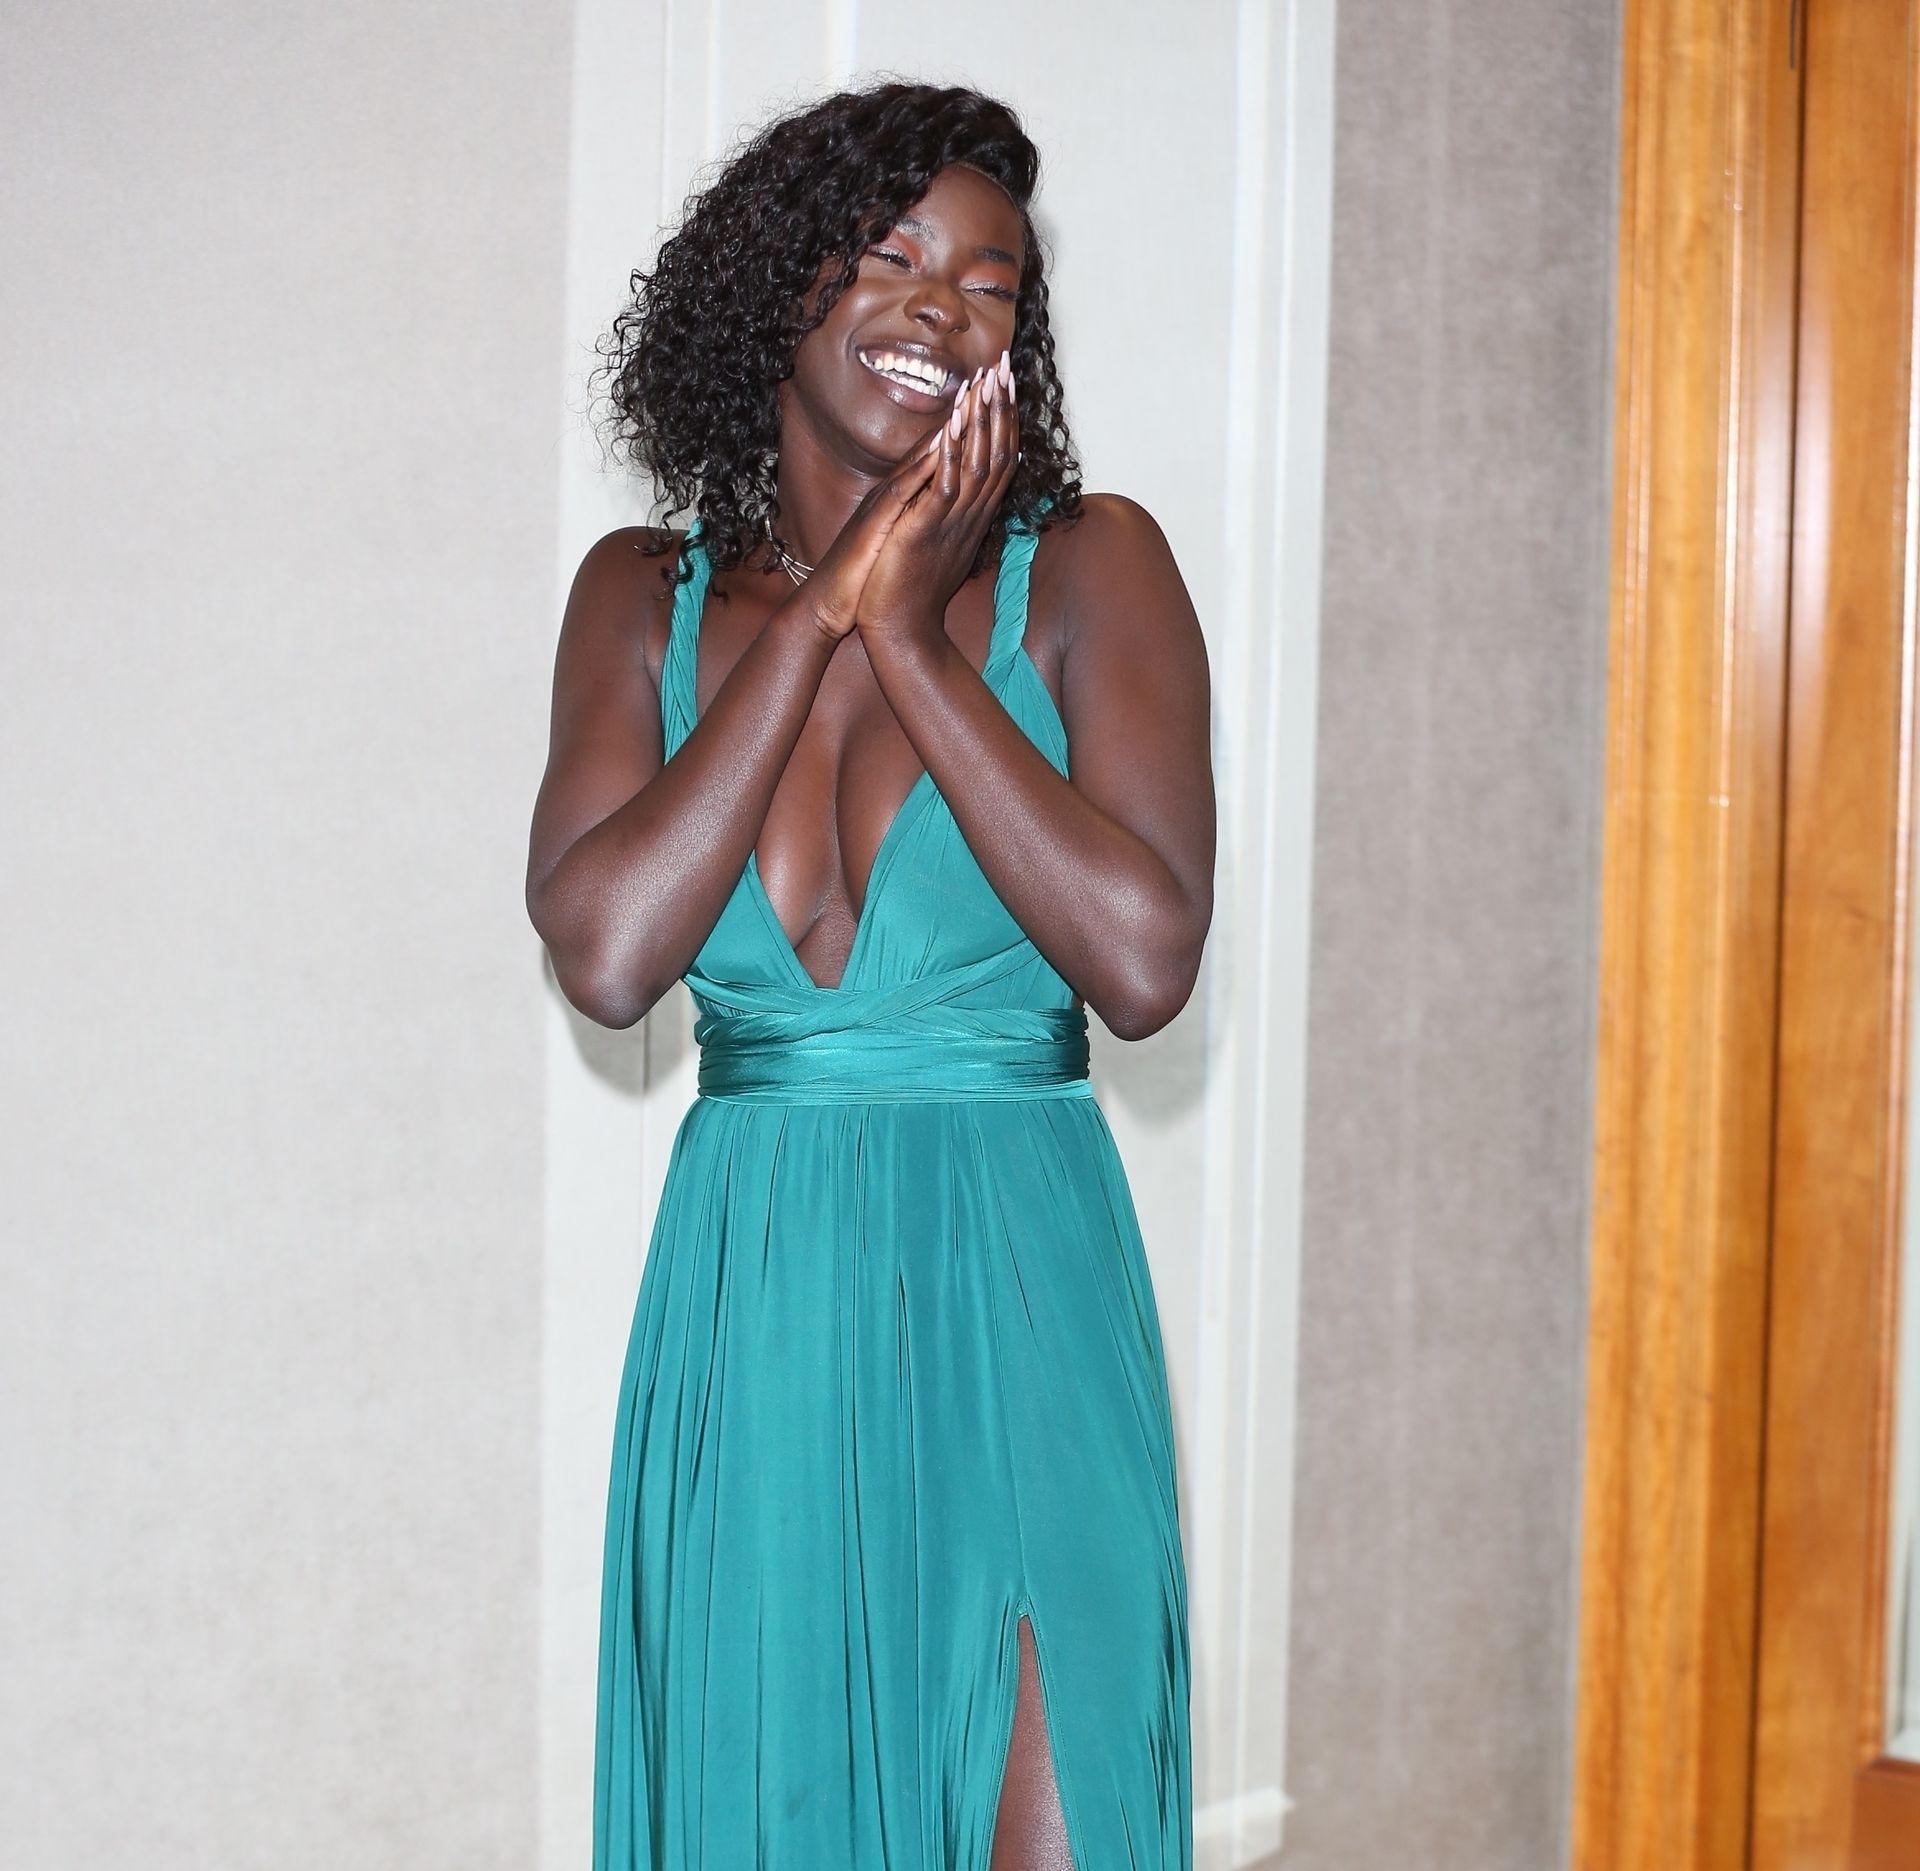 Mike Boateng & Priscilla Anyabu Are Seen At British Ethnic Diversity Sports Awards 0165